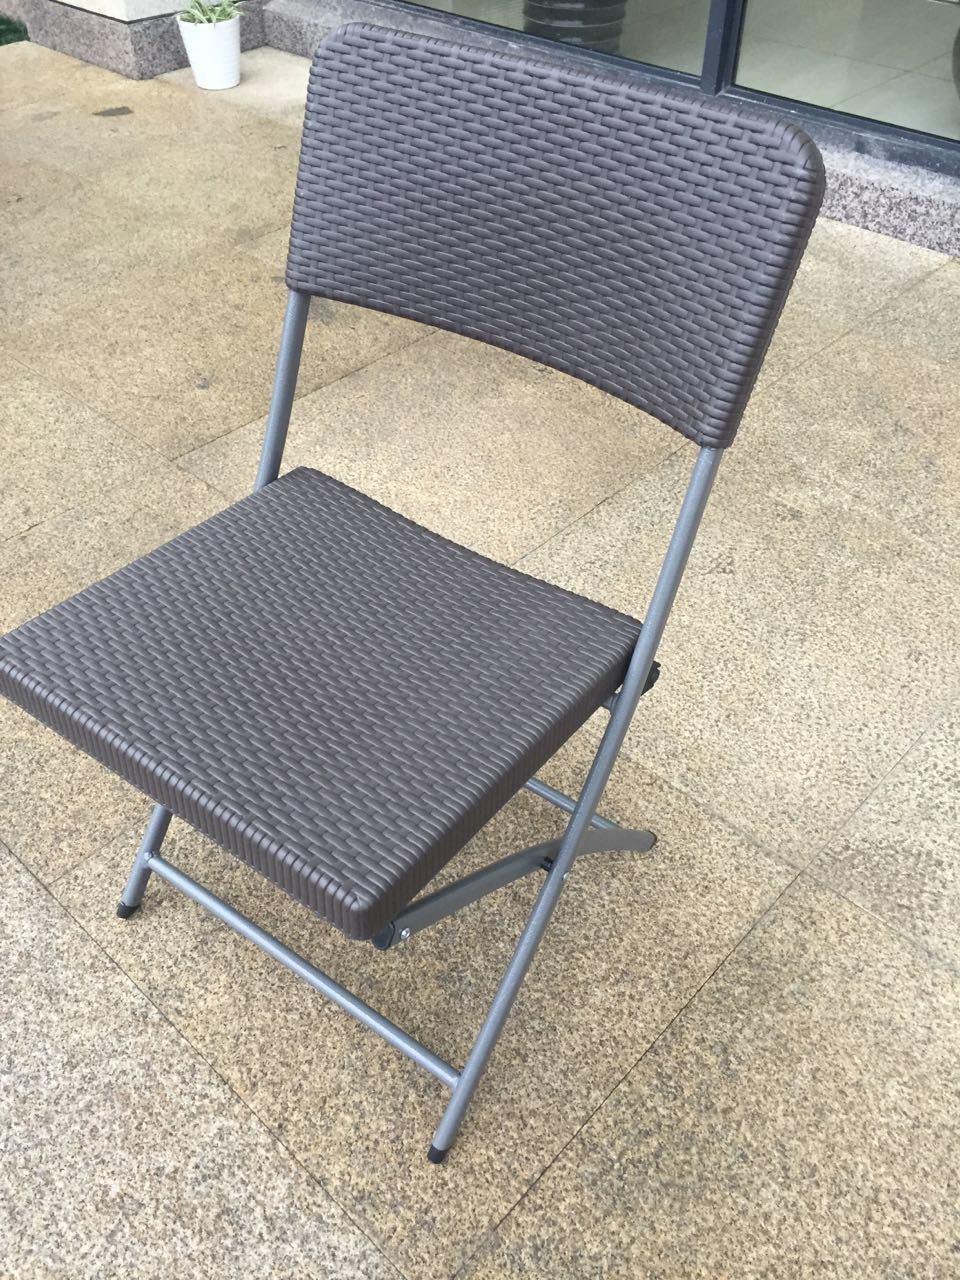 Pleasant Hot Item Wholesale New Imitation Rattan Plastic Folding Chair Garden Chair Outdoor Leisure Chair Cjindustries Chair Design For Home Cjindustriesco